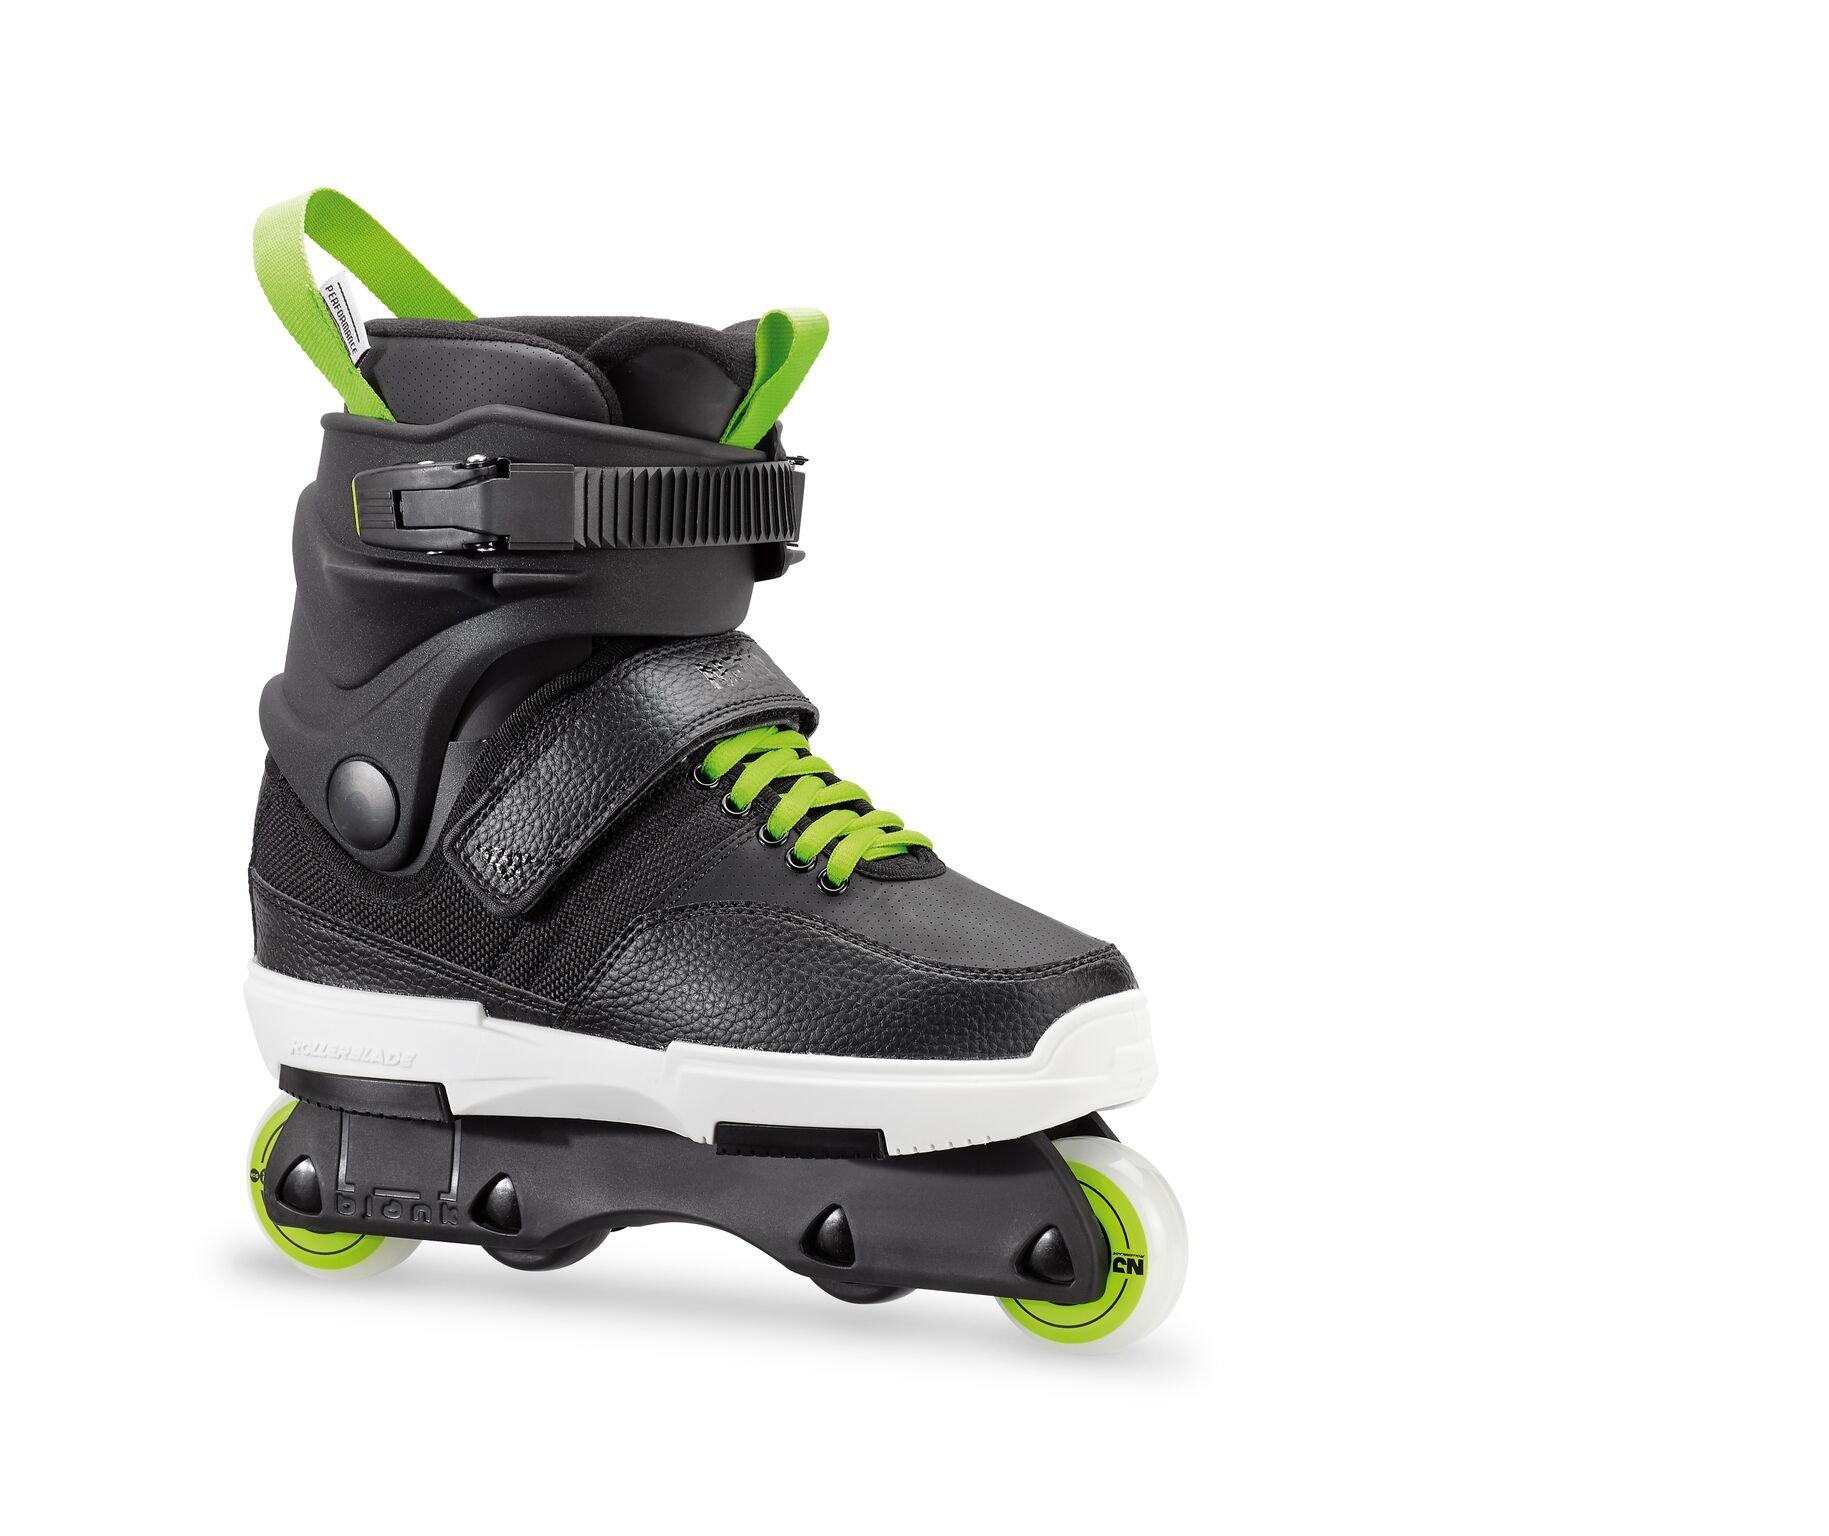 Rollerblade NJR Kid's Size Adjustable Street Inline Skate, Black and Green, High Performance Inline Skates